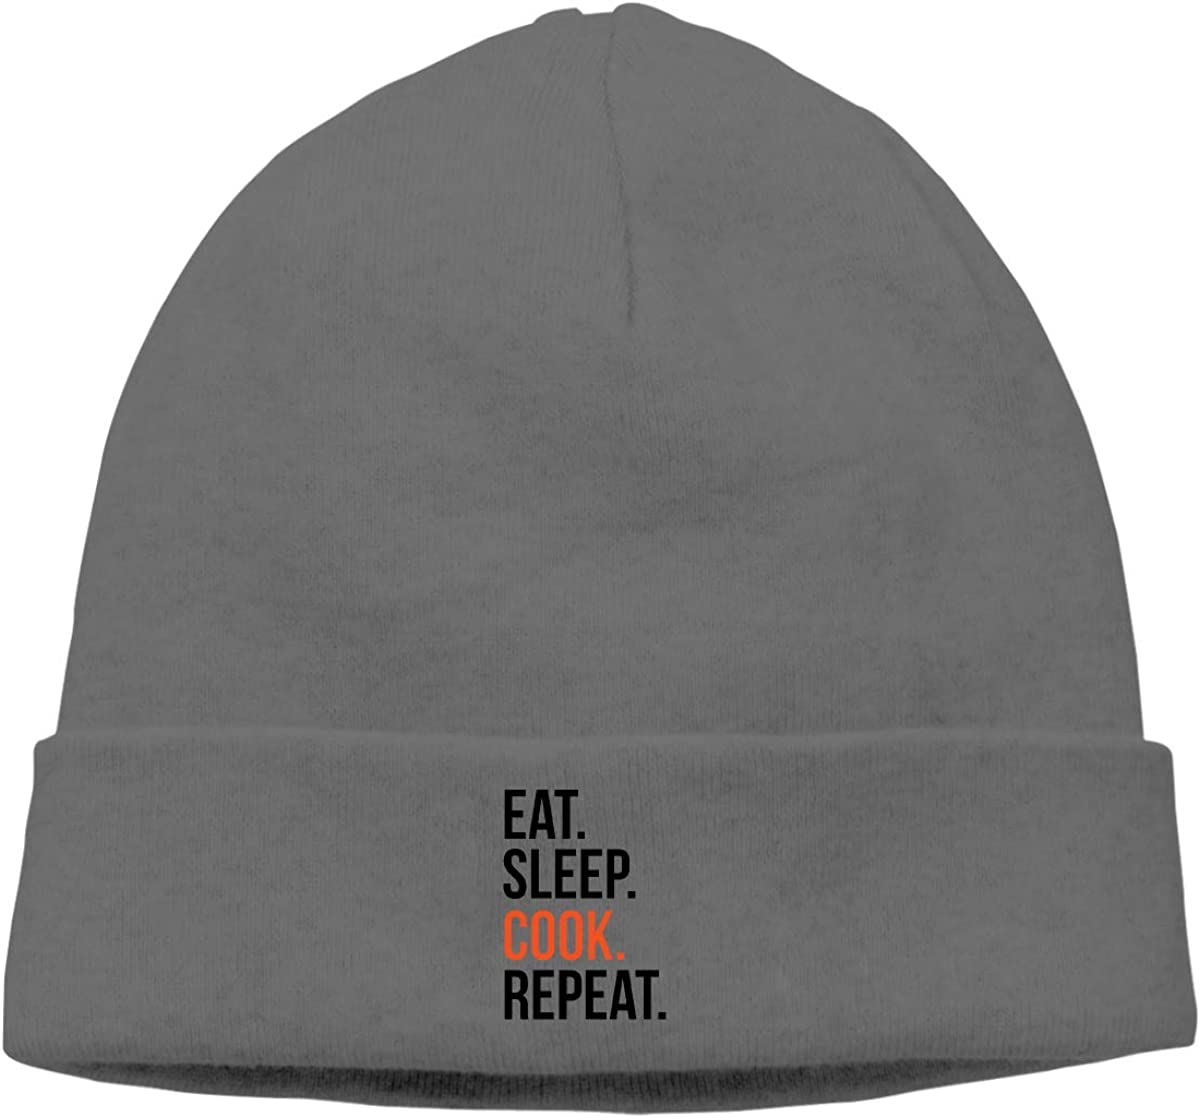 Nskngr Eat Sleep Cook Repeat Logo Mens/&Womens Warm /& Stylish Beanie Hats